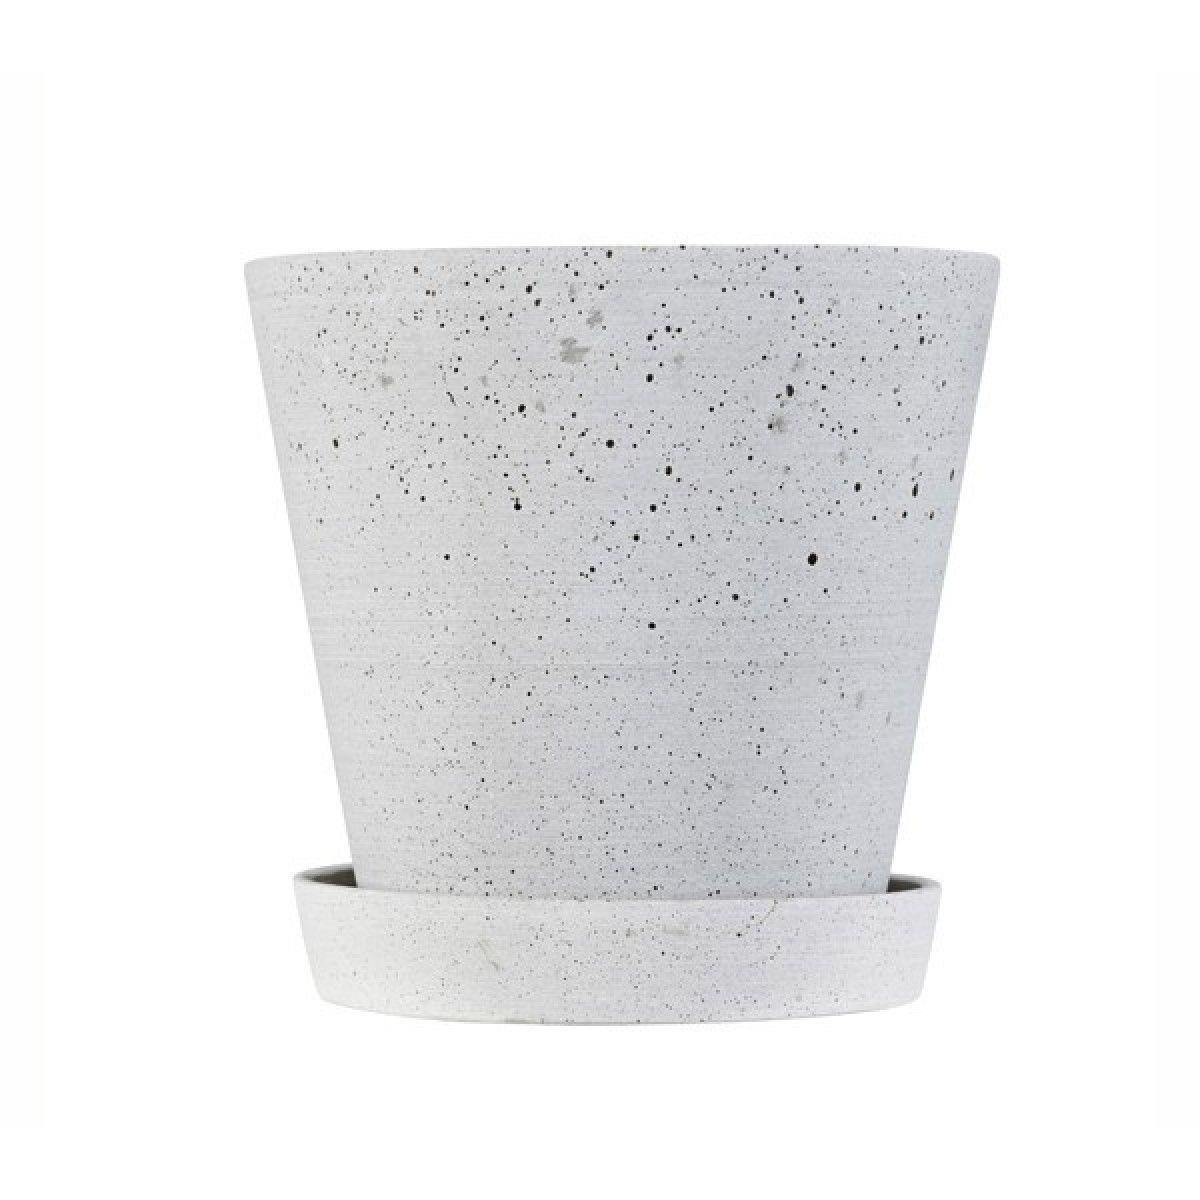 urtepotteskjuler Hay Flowerpot urtepotteskjuler, S   grå | Ønsker | Pinterest  urtepotteskjuler